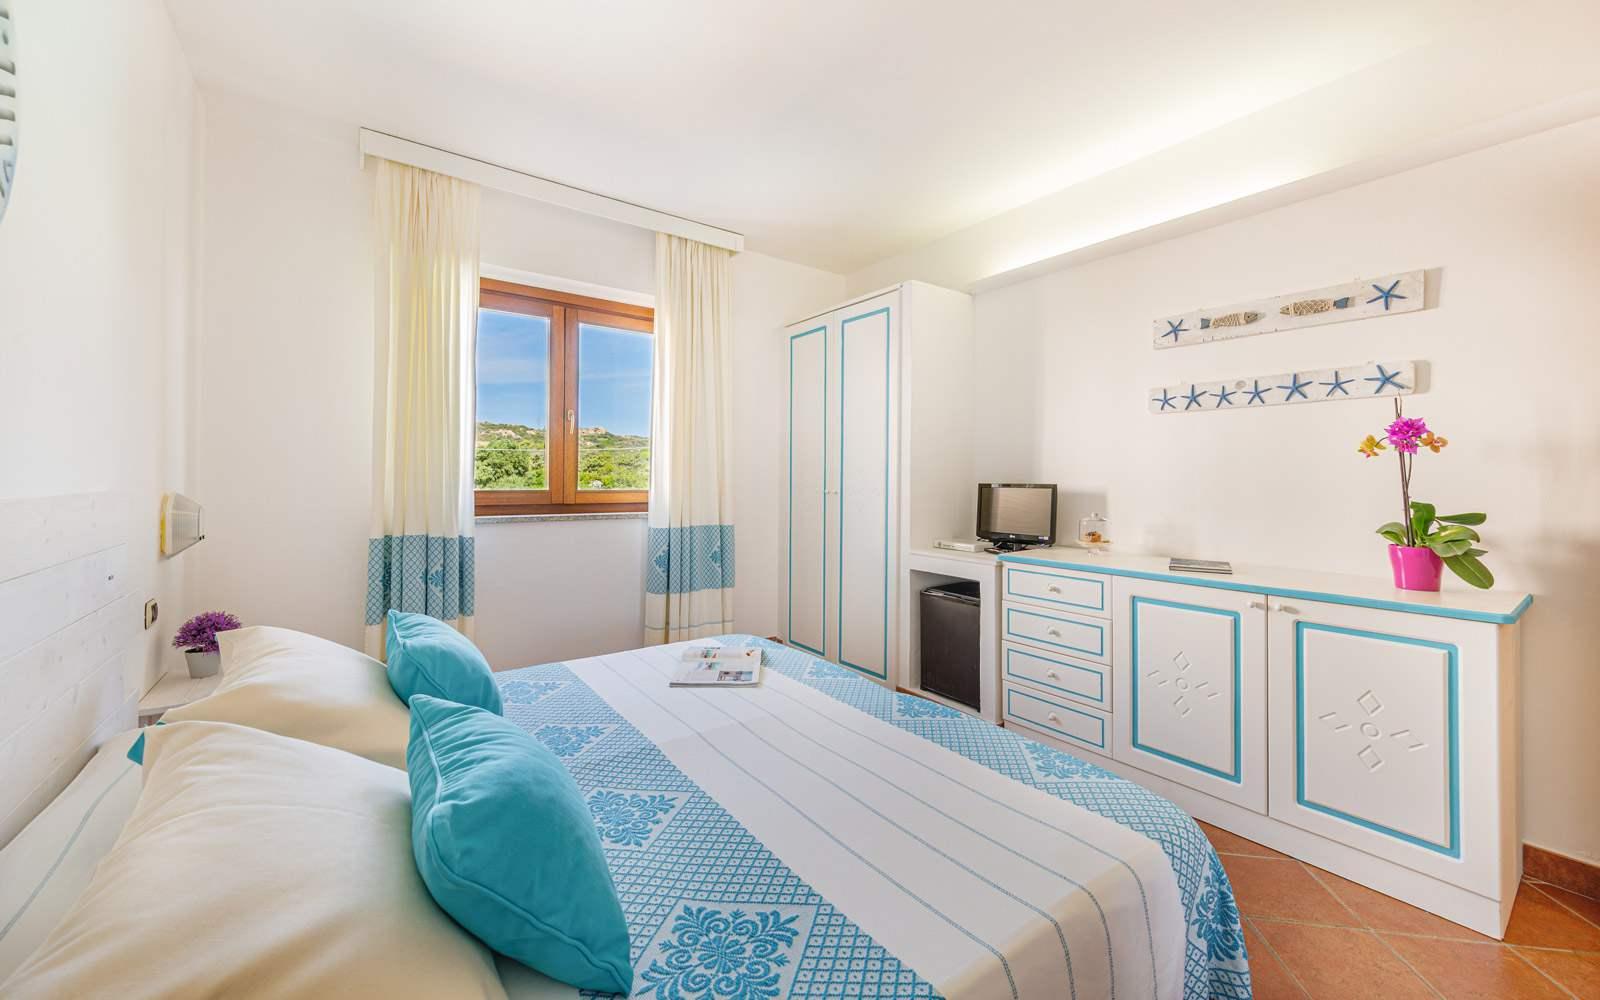 Hotel La Funtana Classic Room